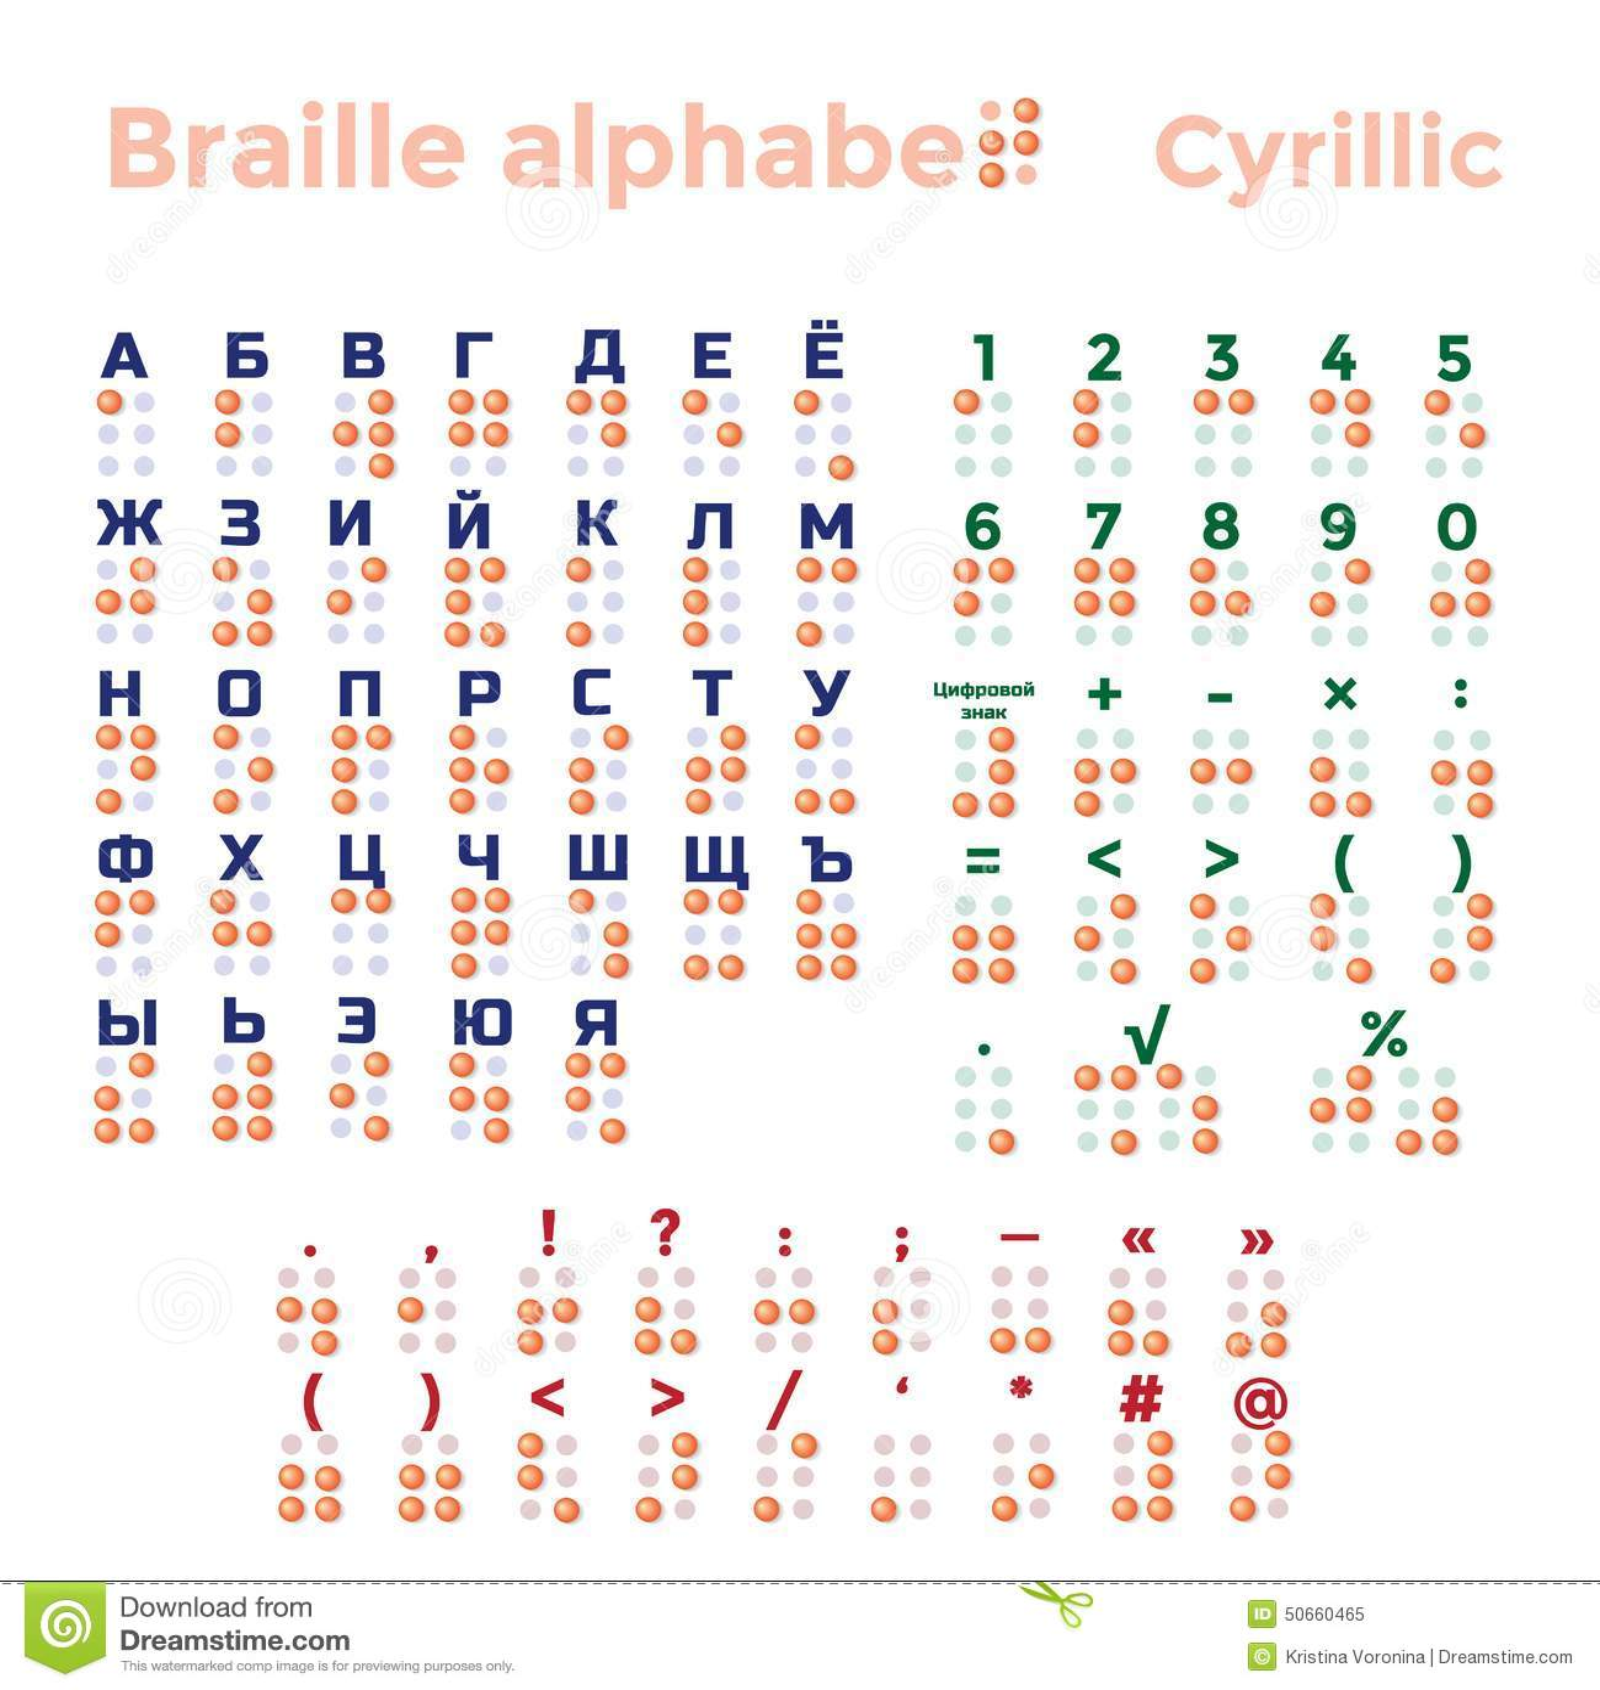 Sistema russo alfabeto russo